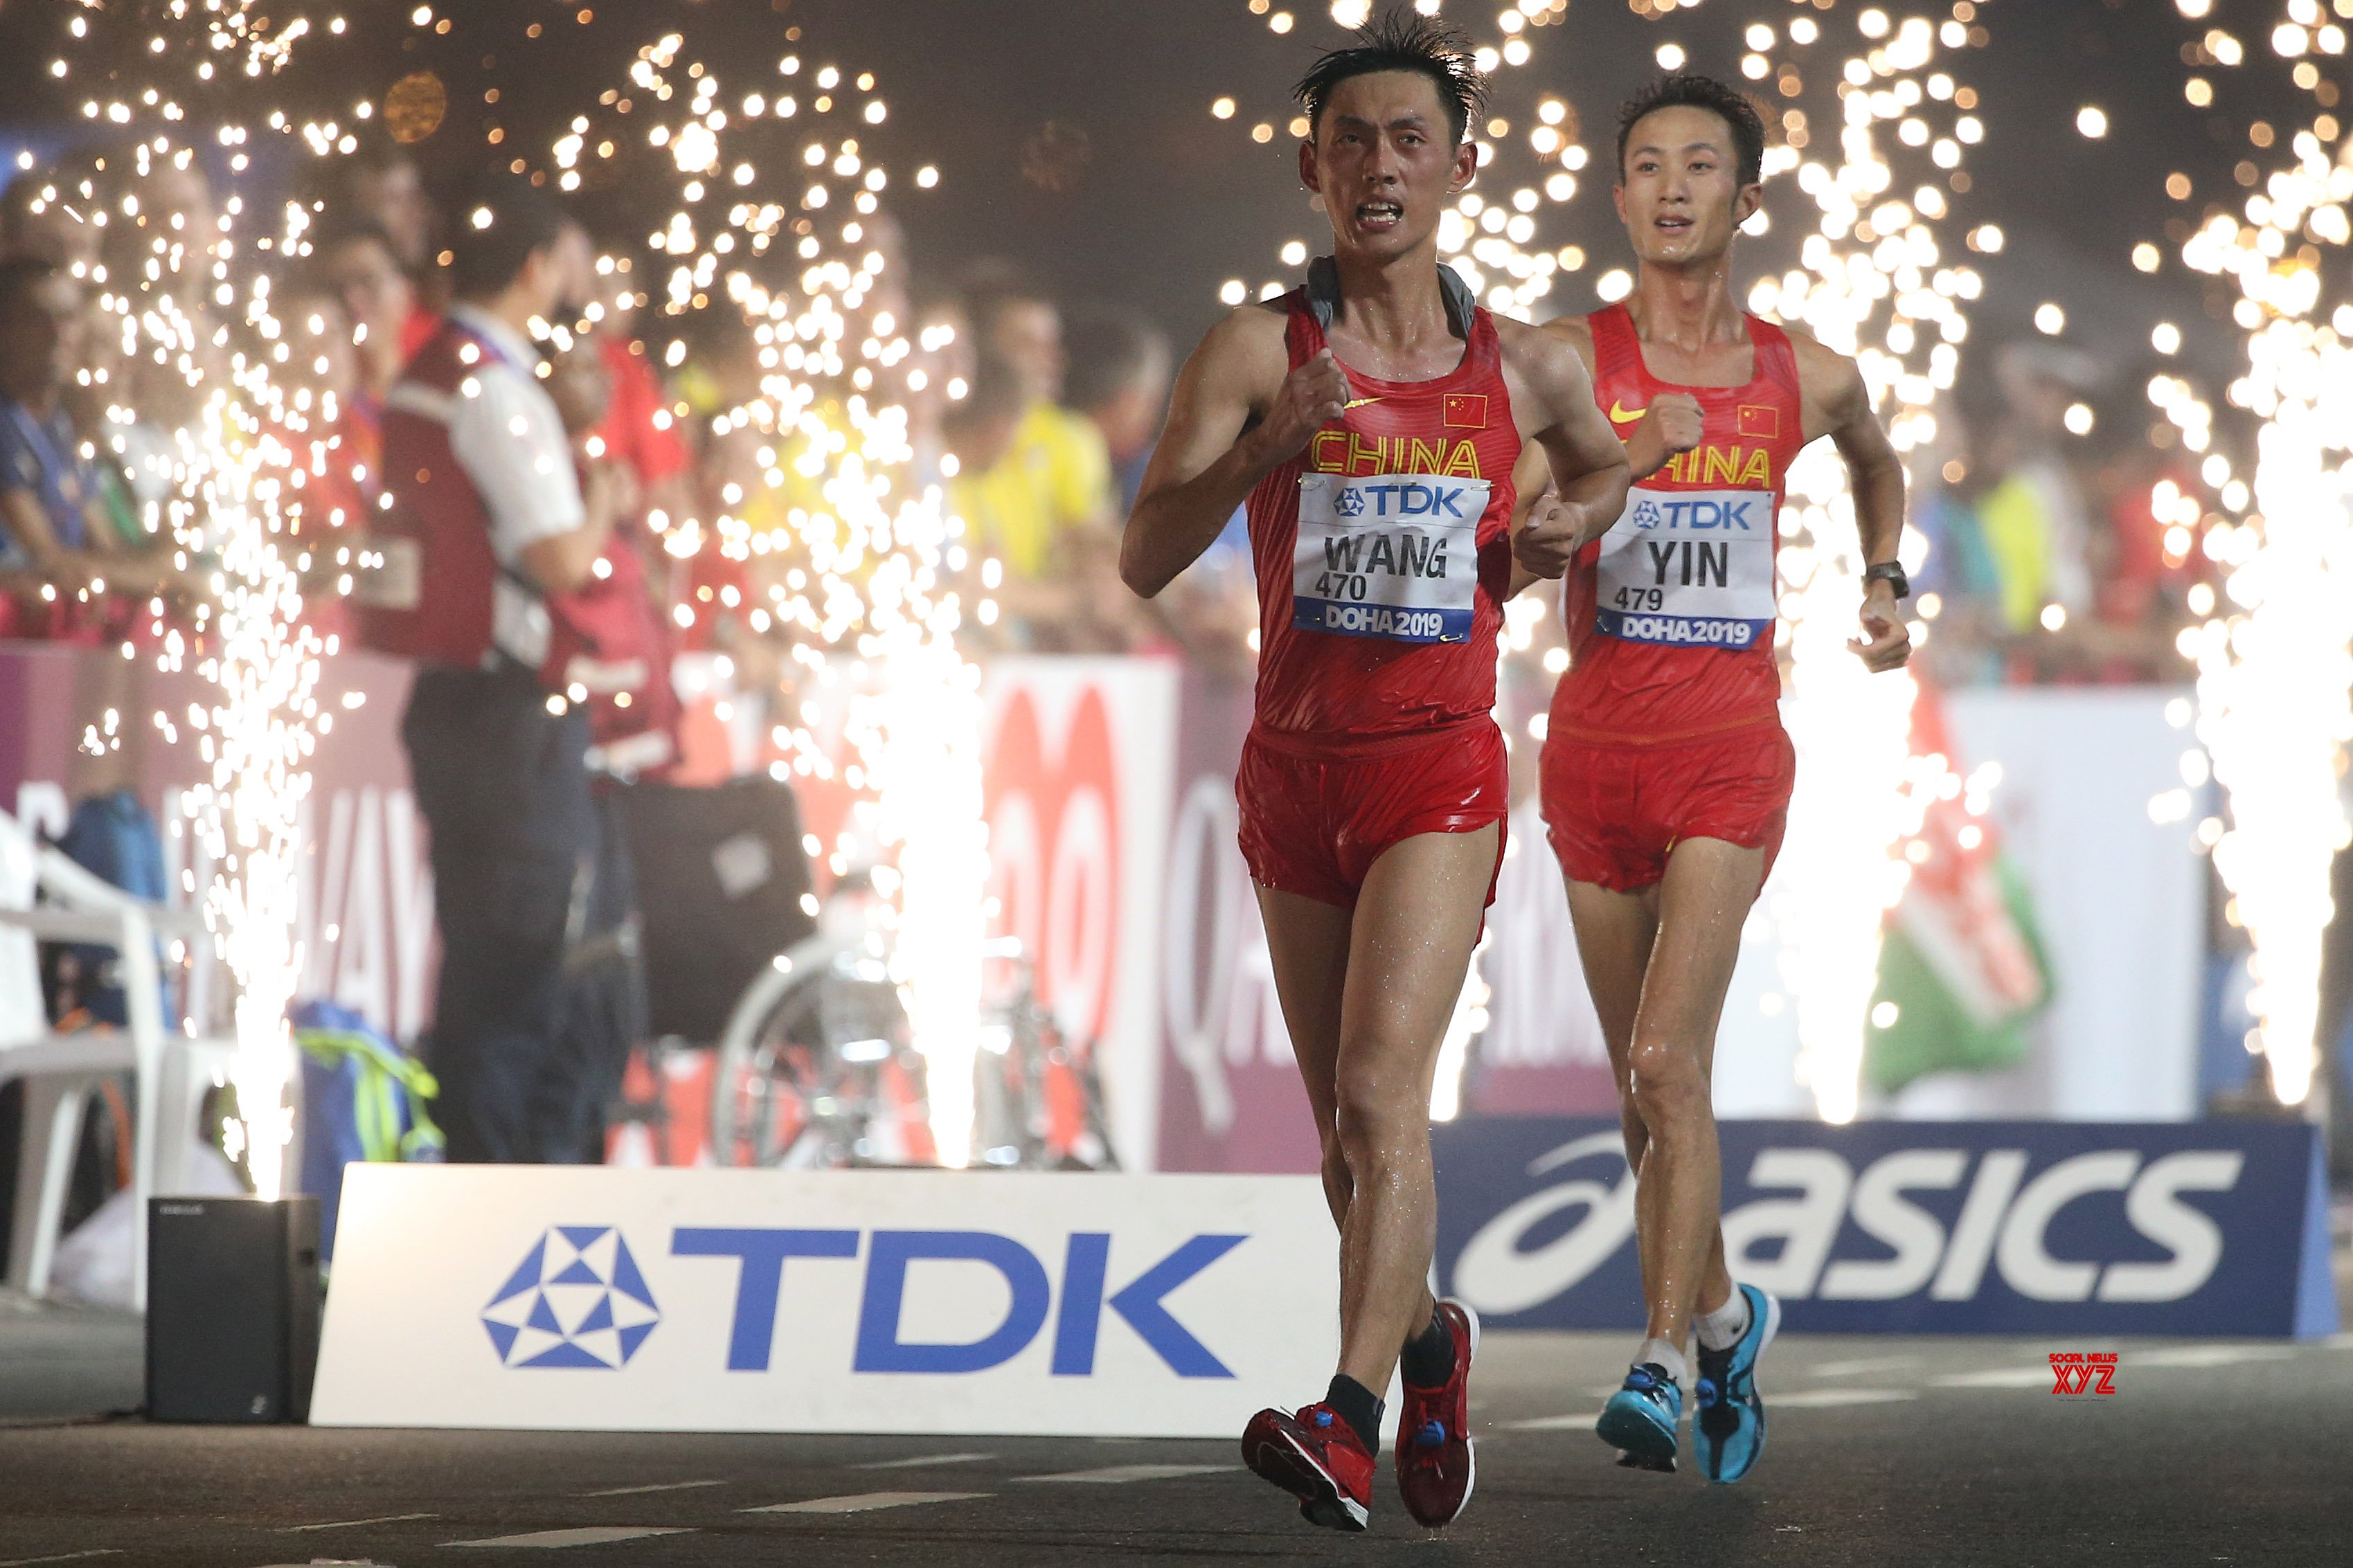 QATAR - DOHA - ATHLETICS - IAAF WORLD CHAMPIONSHIPS - MEN - 20KM RACE WALK #Gallery